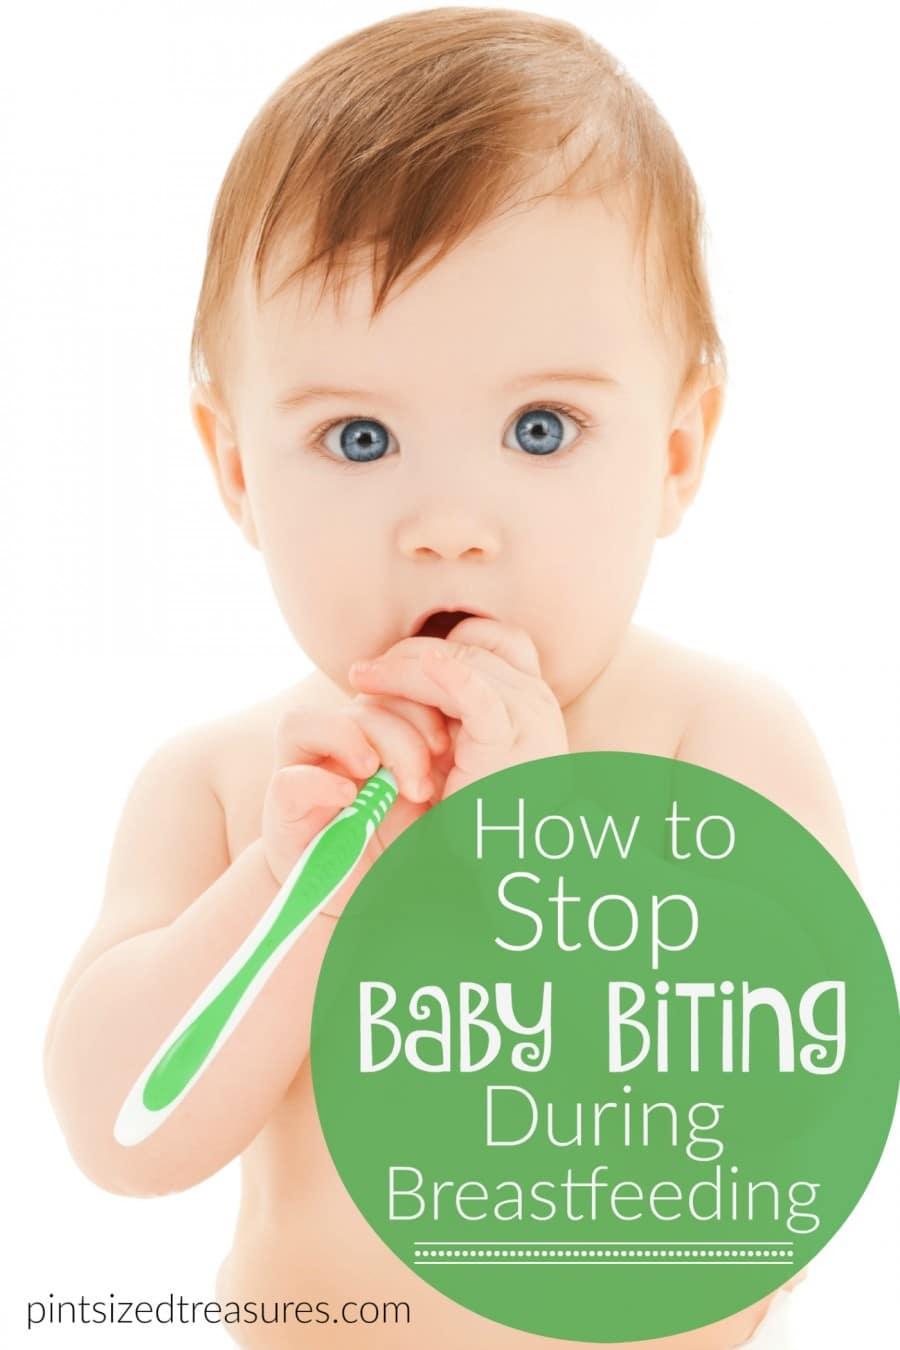 biting during breast feeding